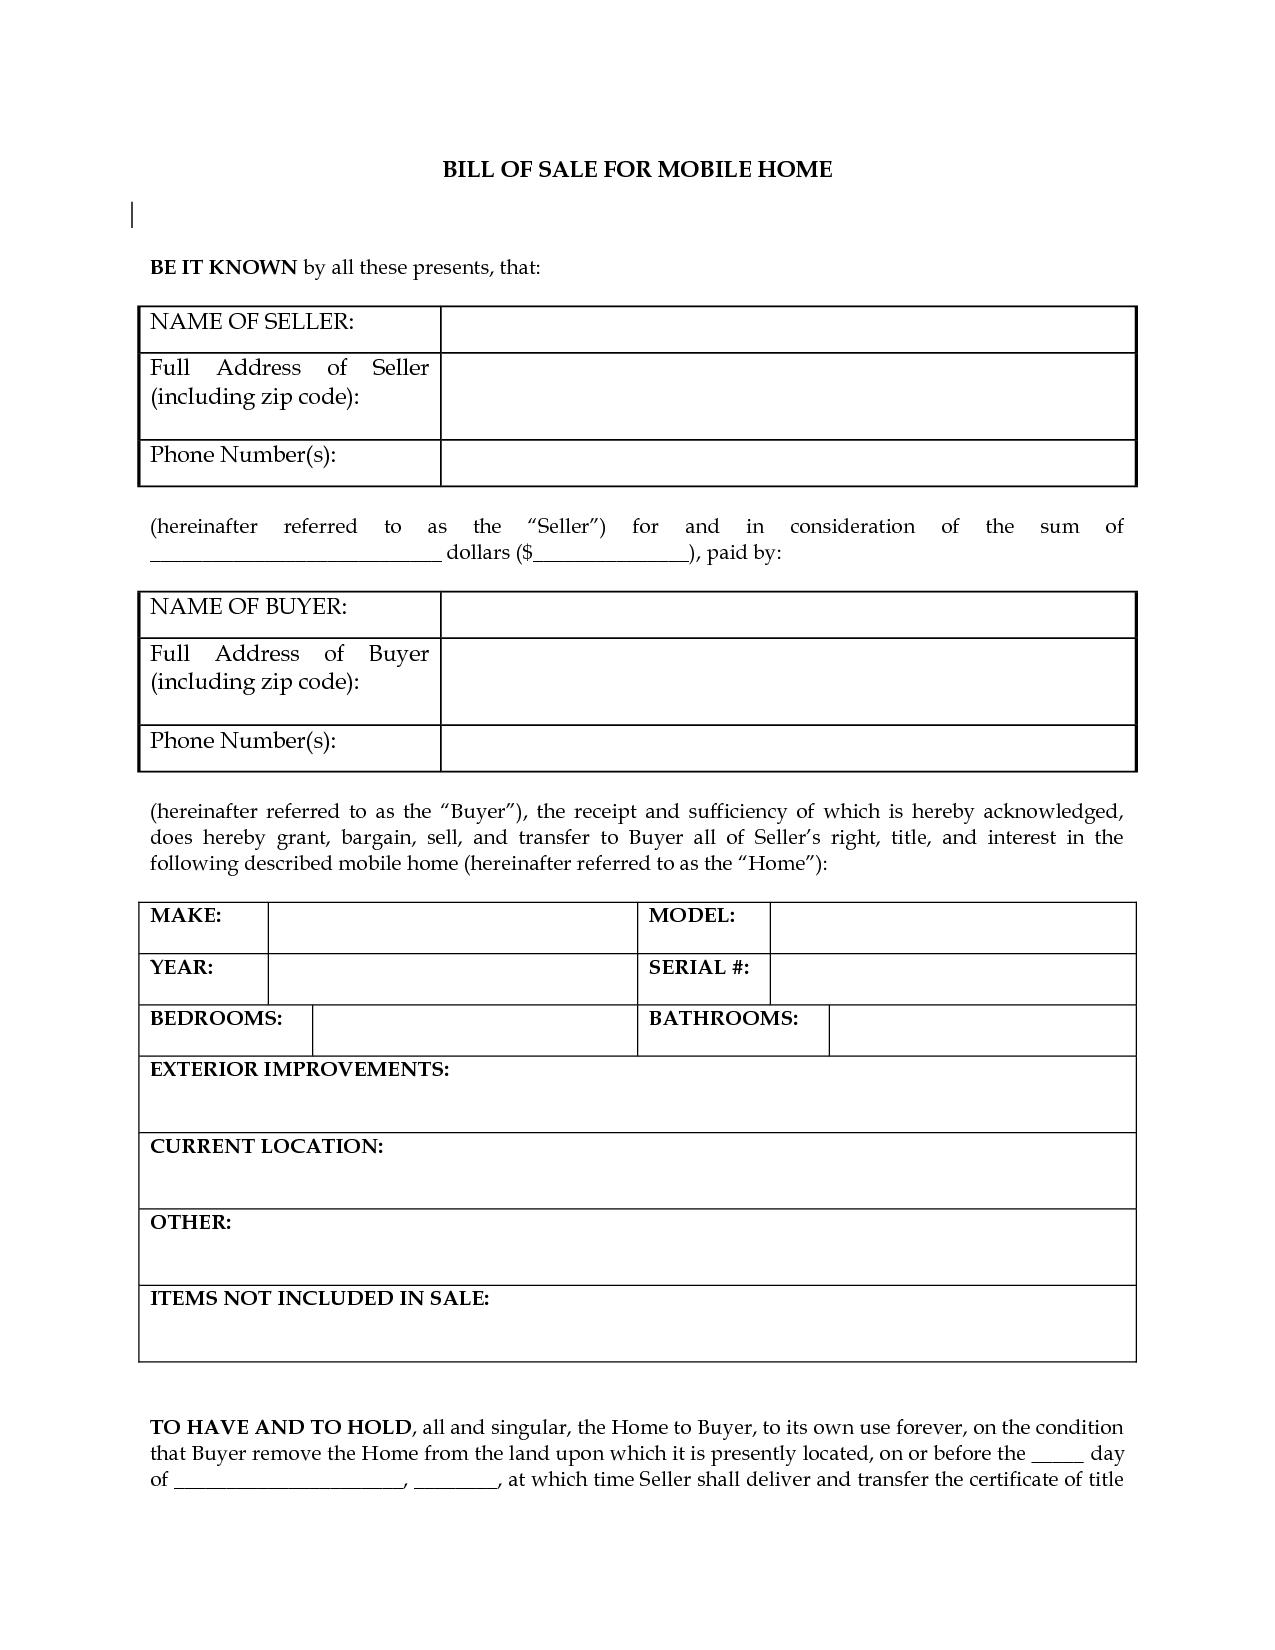 Free Printable Bill Of Sale Camper Form (Generic) - Free Printable Bill Of Sale For Mobile Home